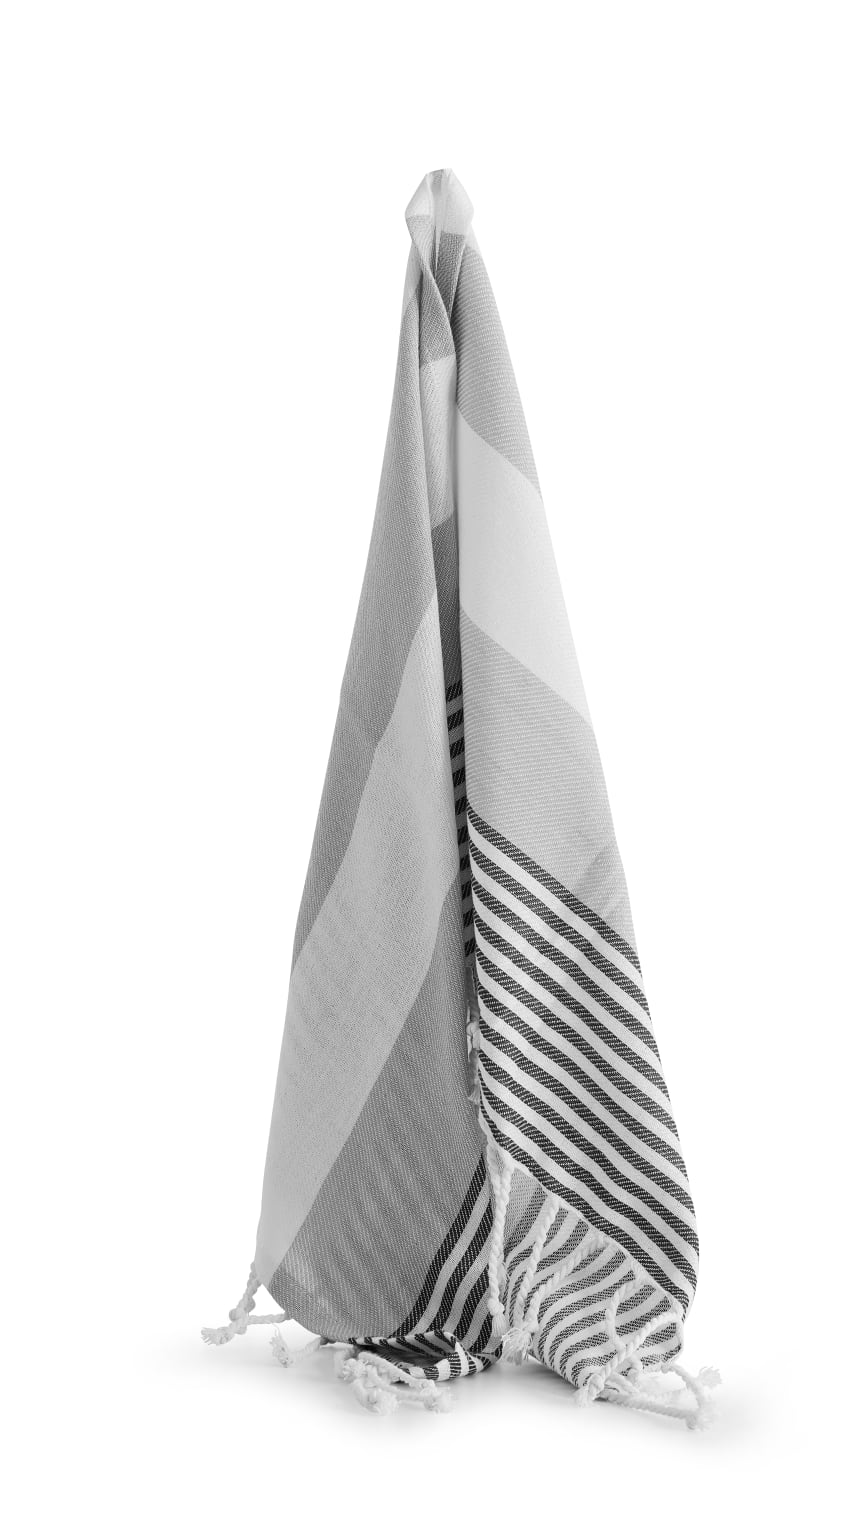 Hamam handduk liten ECO 50 x 70 cm,grå